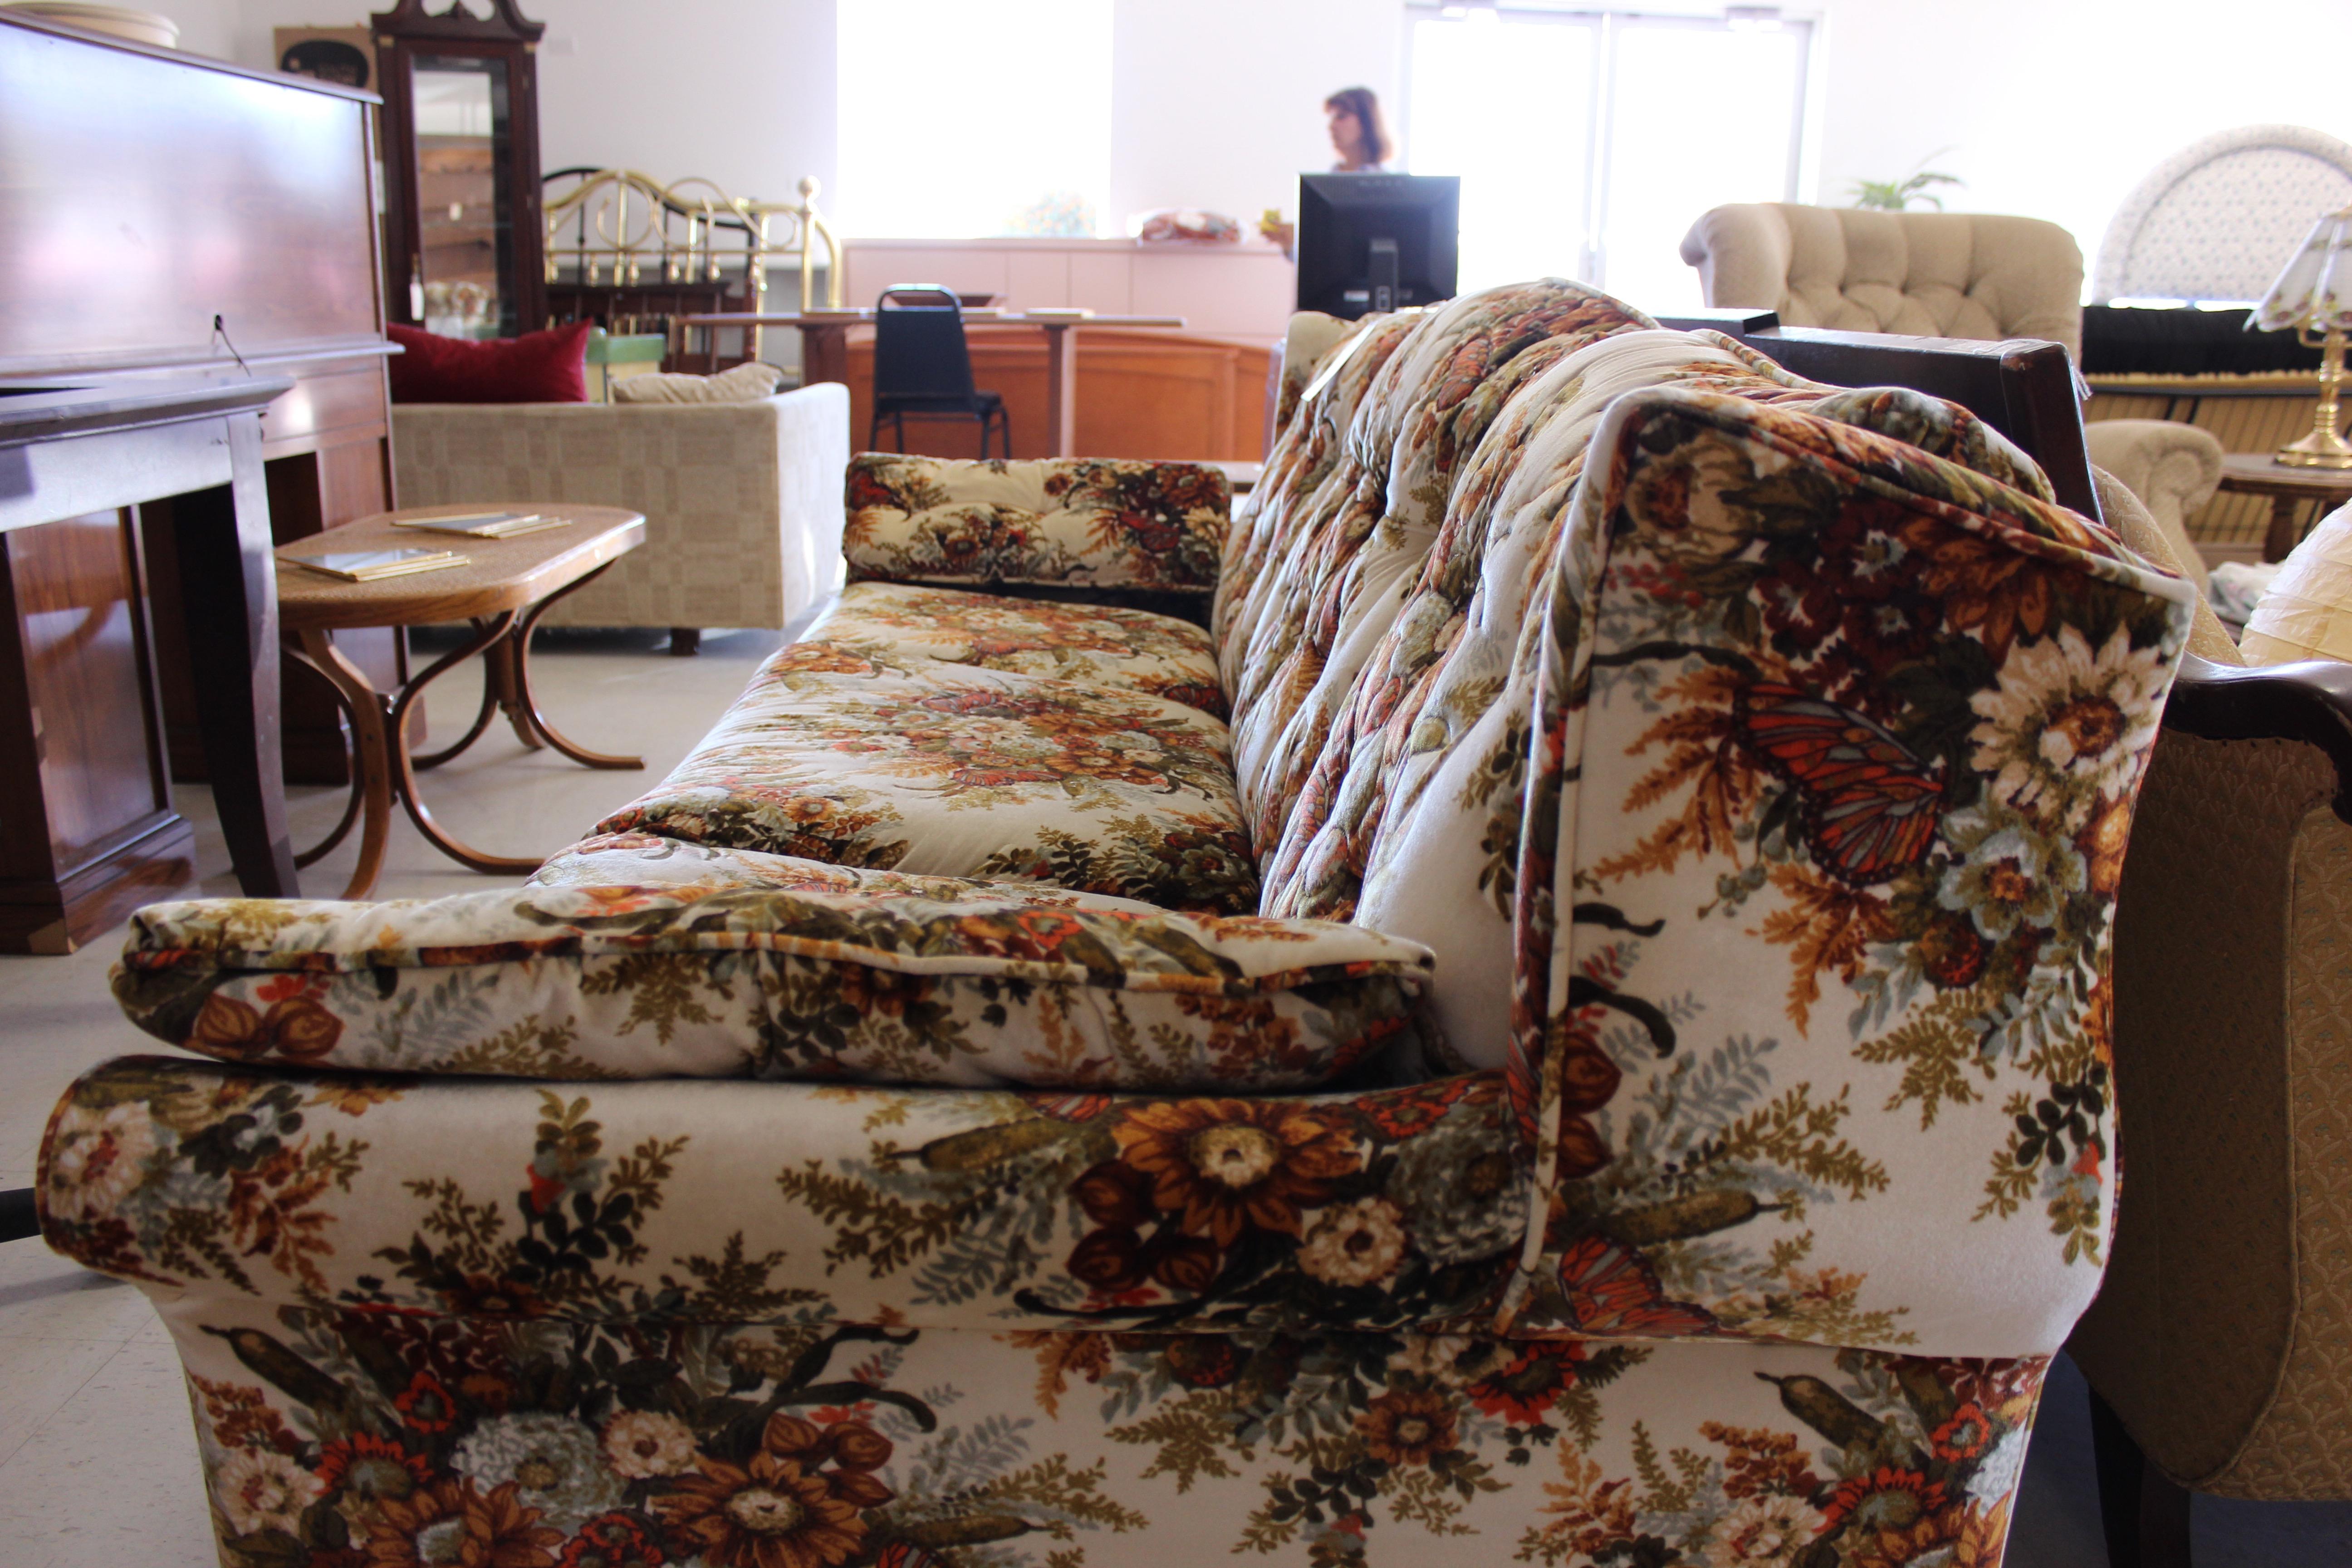 One of kind furniture